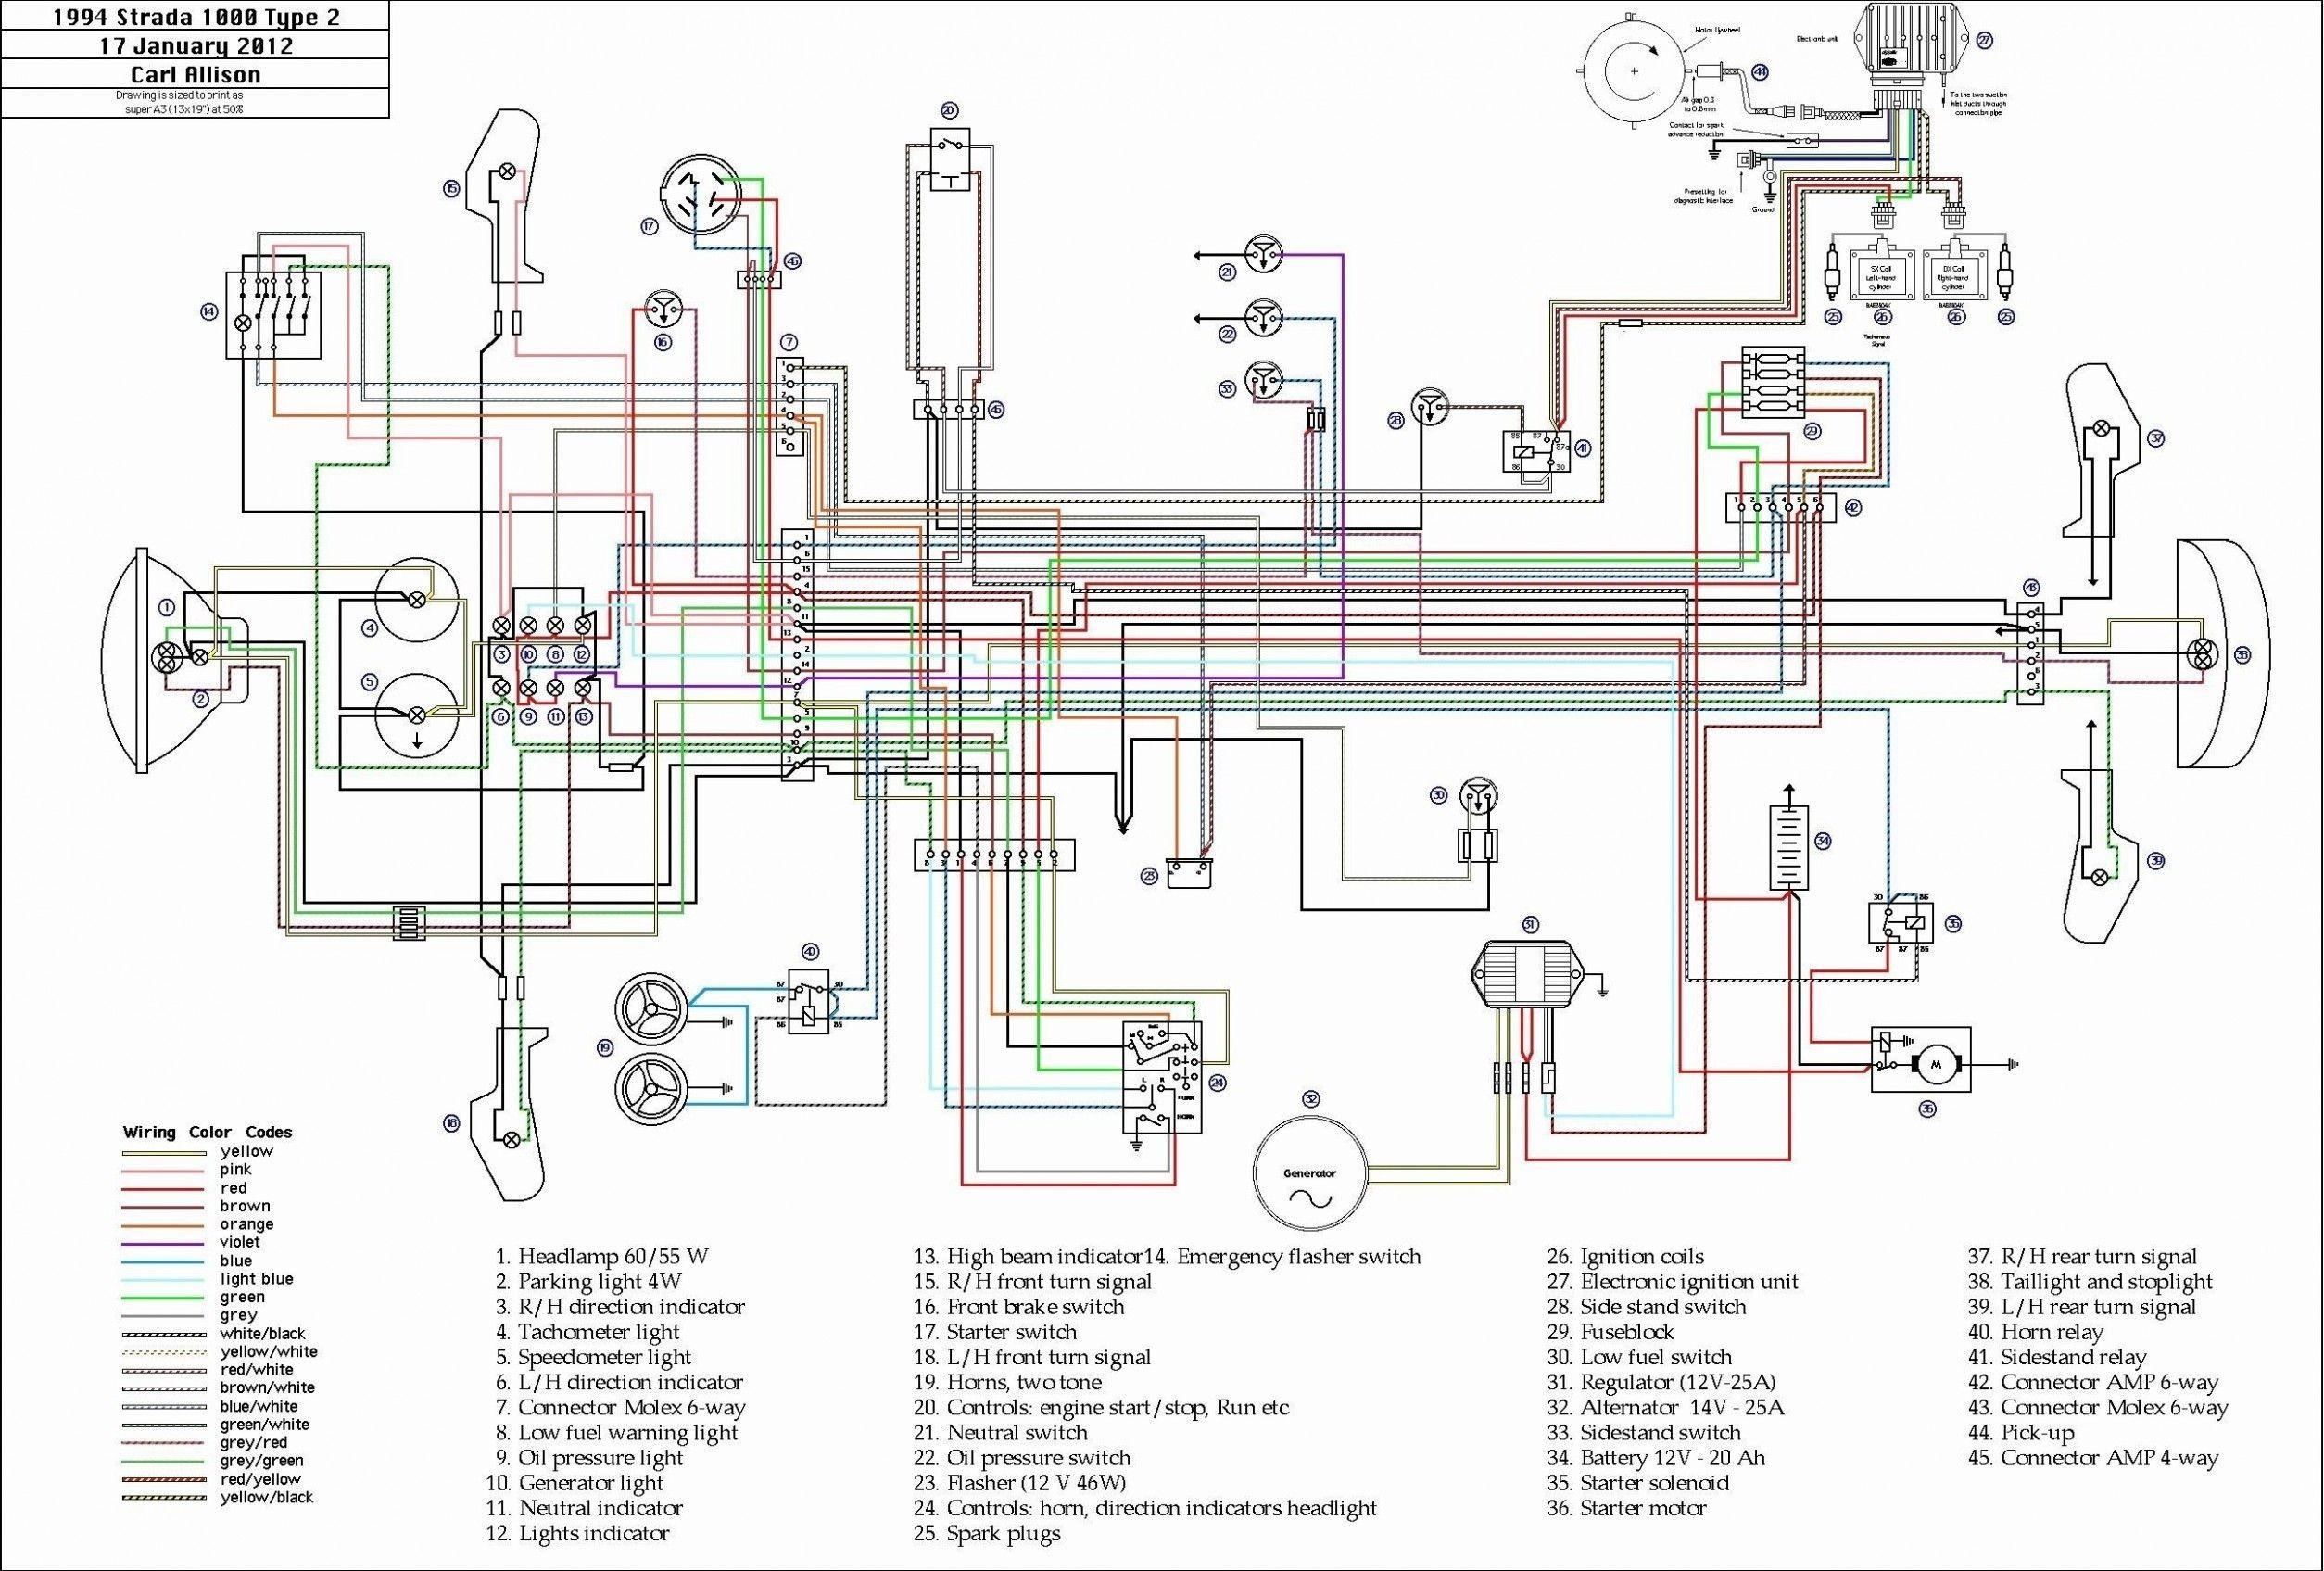 2 Pin Flasher Vs 3 Pin Flasher Engine Indicator Diagram Honda Di 2020 Of 2 Pin Flasher Vs 3 Pin Flasher